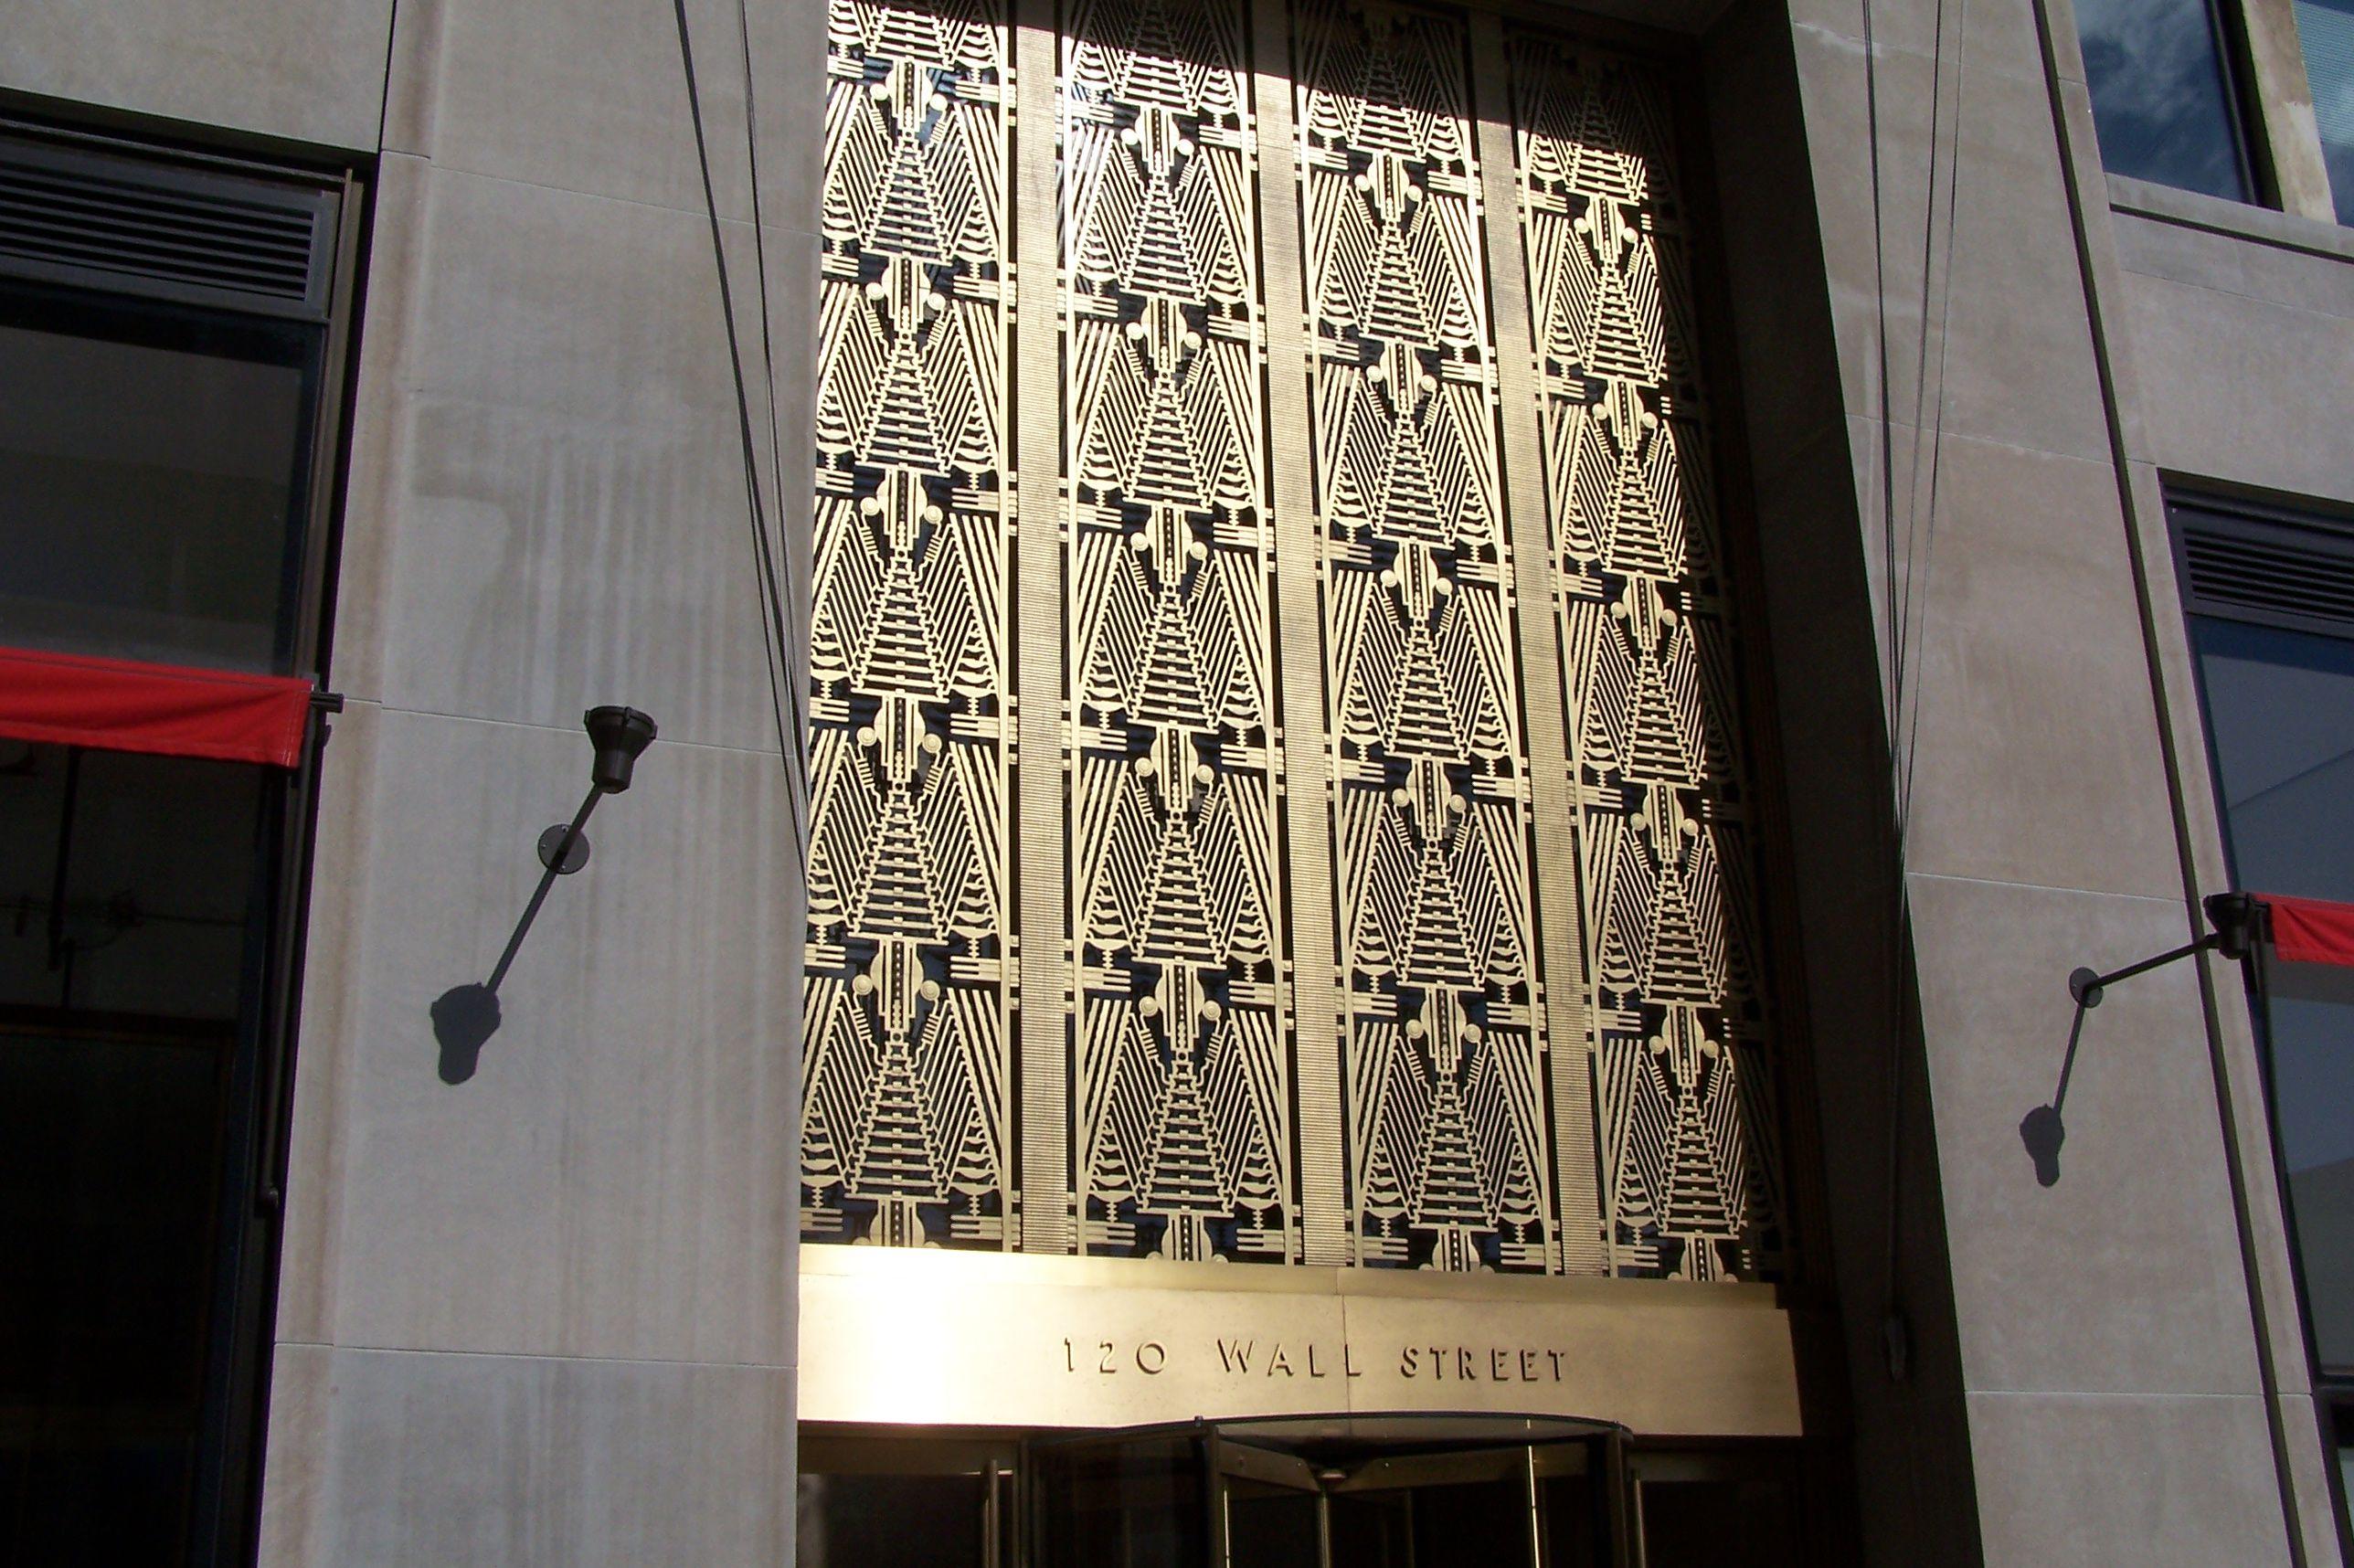 The shiny metal art deco entrance to 120 Wall Street